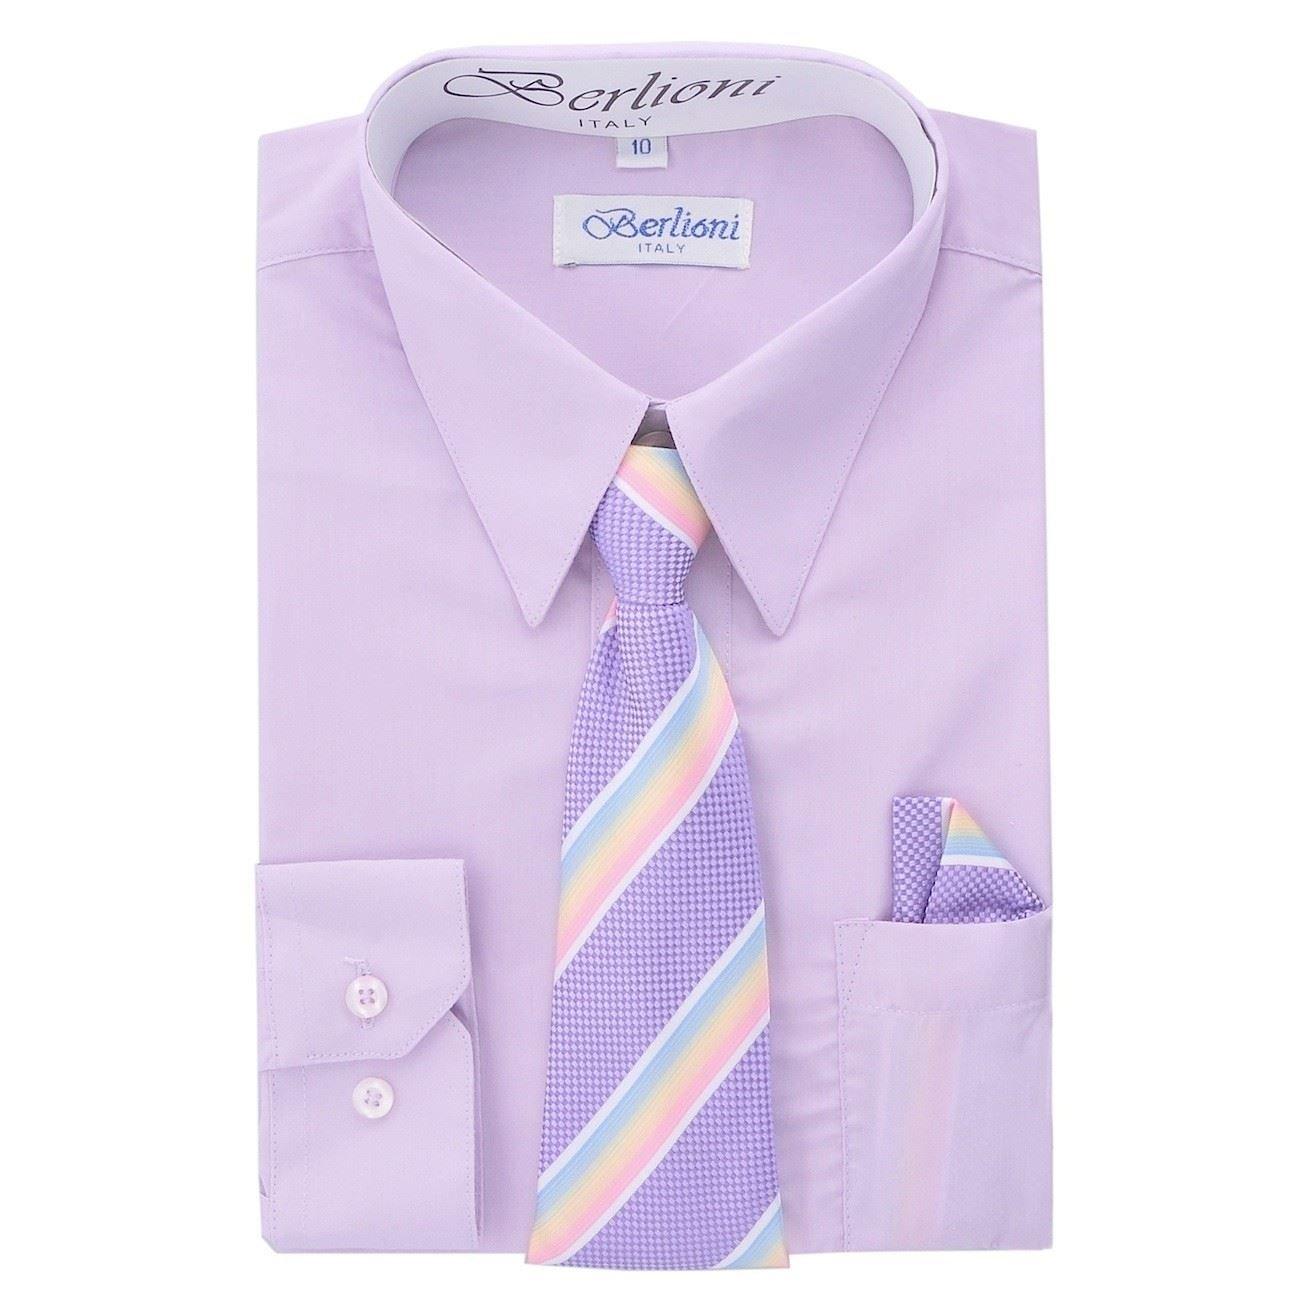 Berlioni Italy Kids Boys Dress Shirt with Tie & Hanky Long Sleeves Lilac